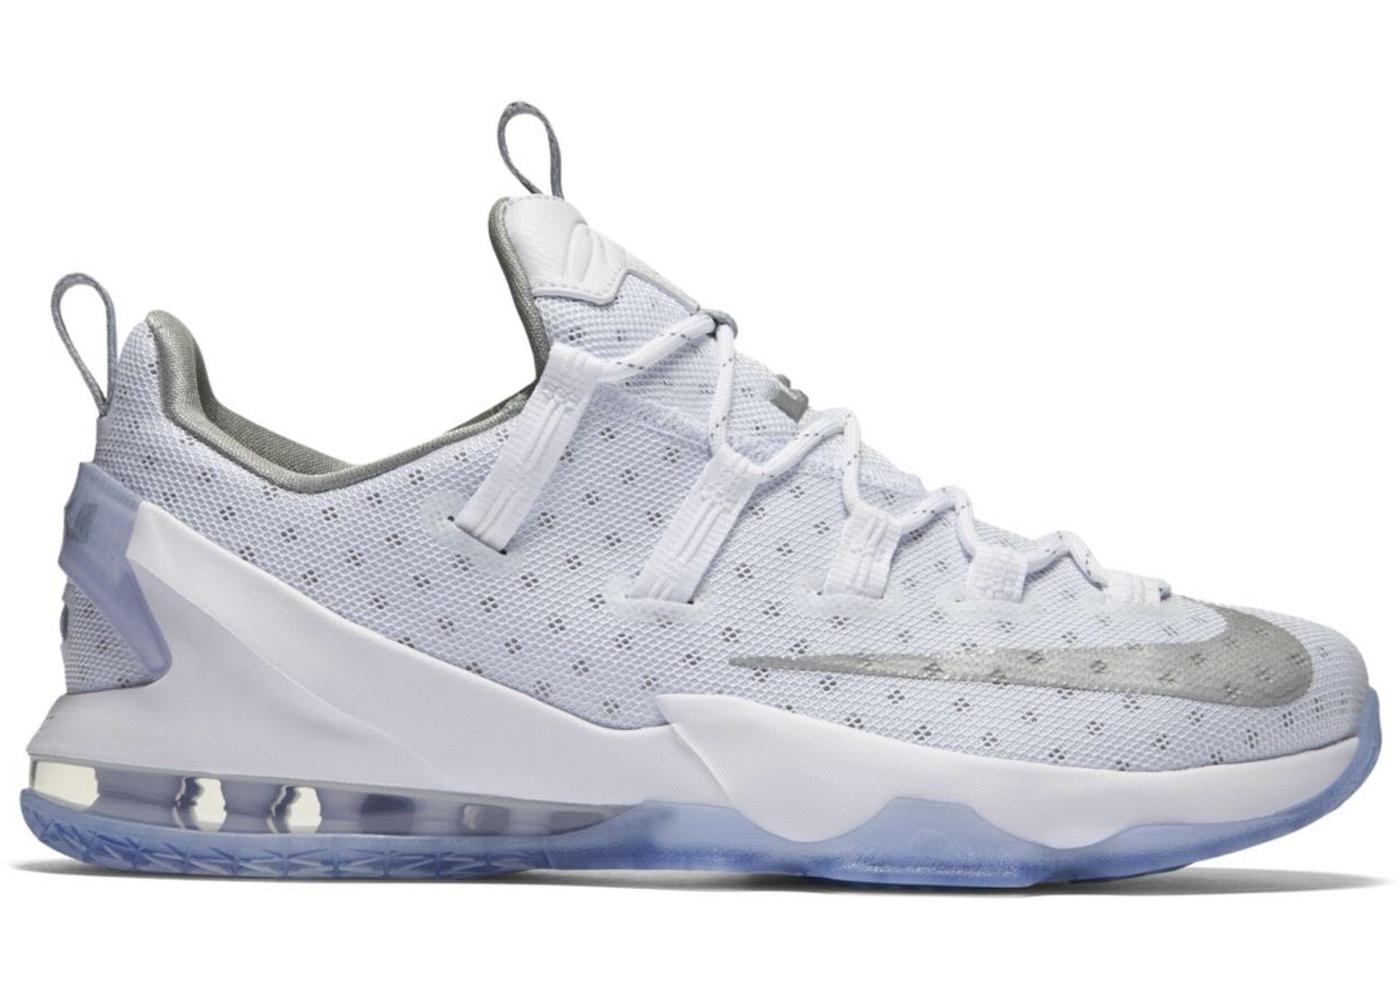 4b0901f589306e Buy Nike LeBron 13 Shoes   Deadstock Sneakers